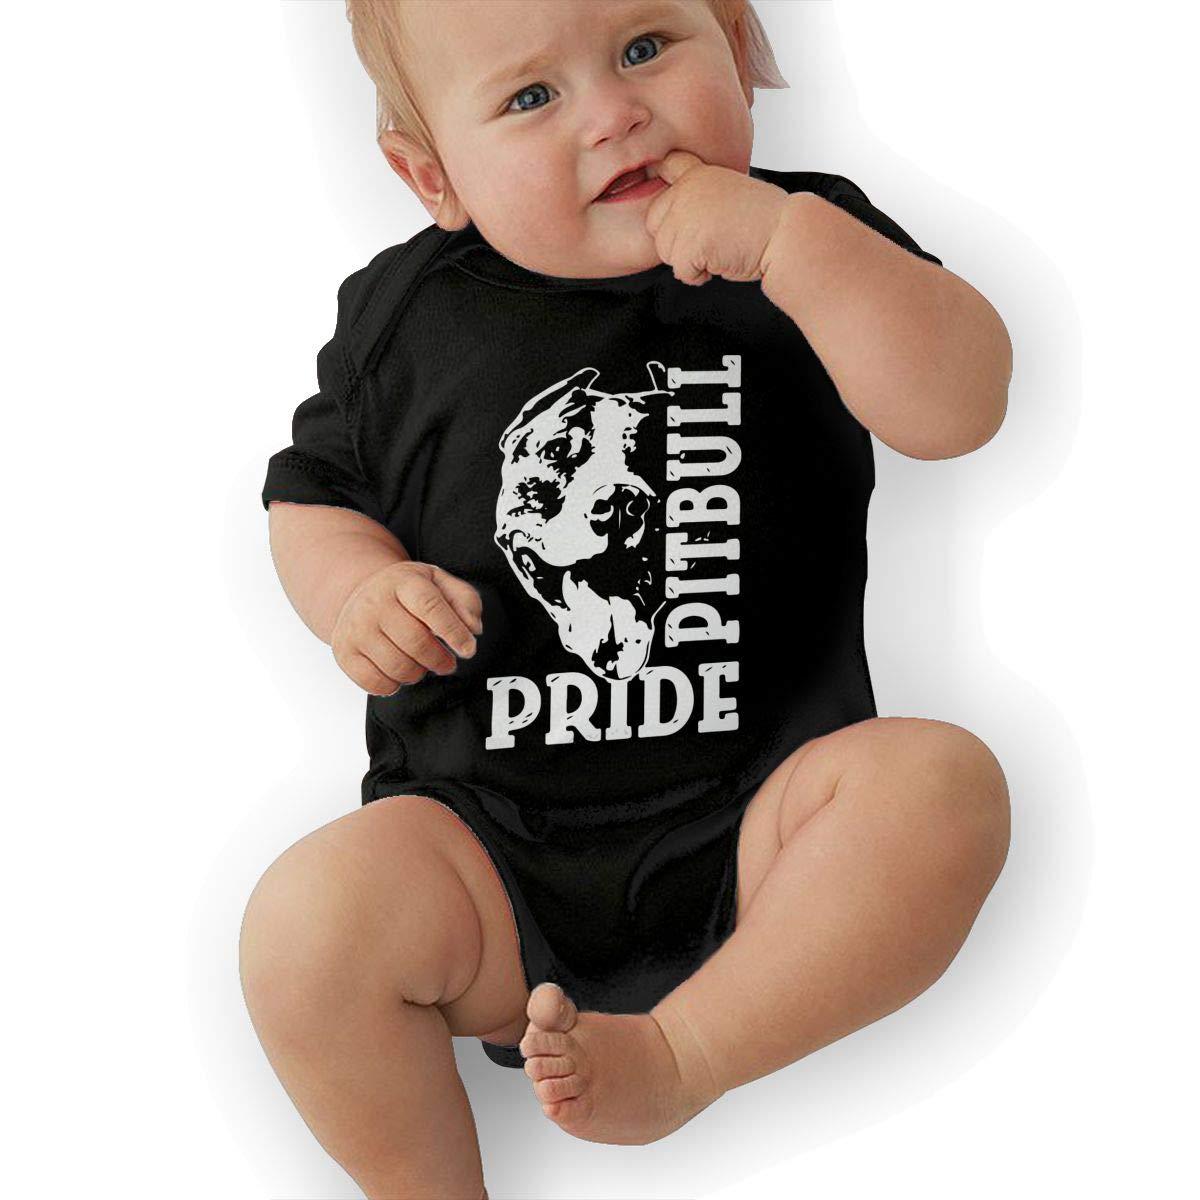 U88oi-8 Short Sleeve Cotton Bodysuit for Unisex Baby Soft Pitbull Pride Playsuit